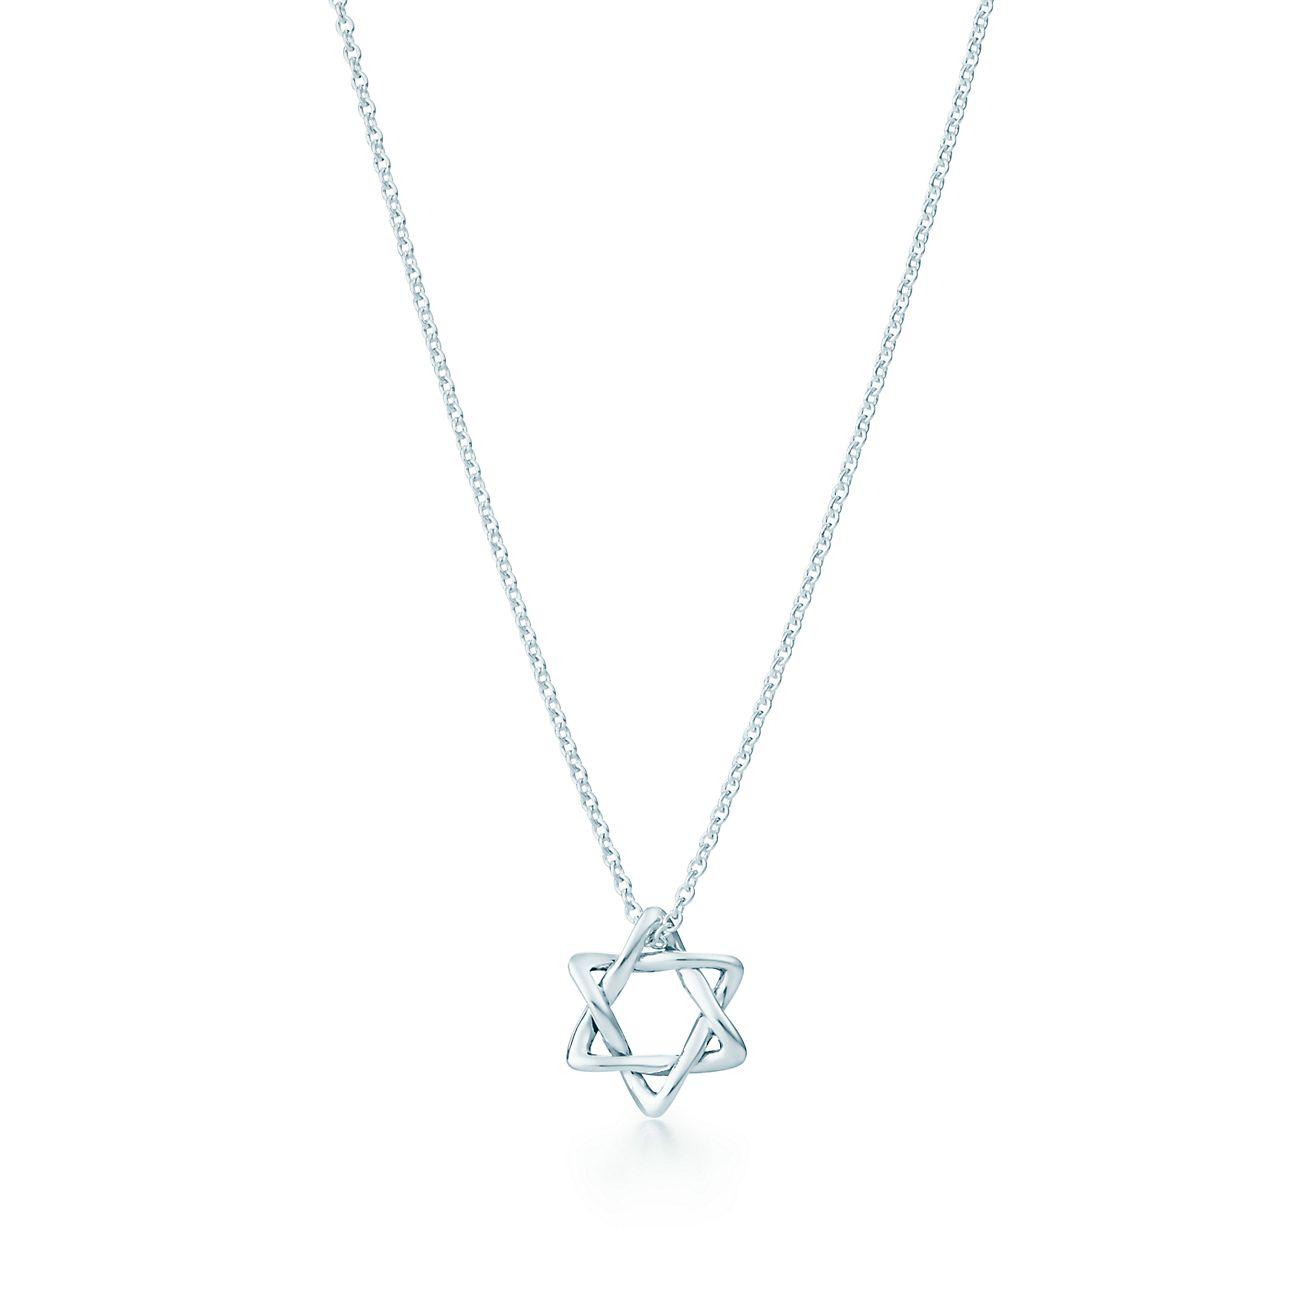 Elsa peretti star of david pendant in sterling silver 12 mm wide elsa perettistar of david pendant aloadofball Choice Image